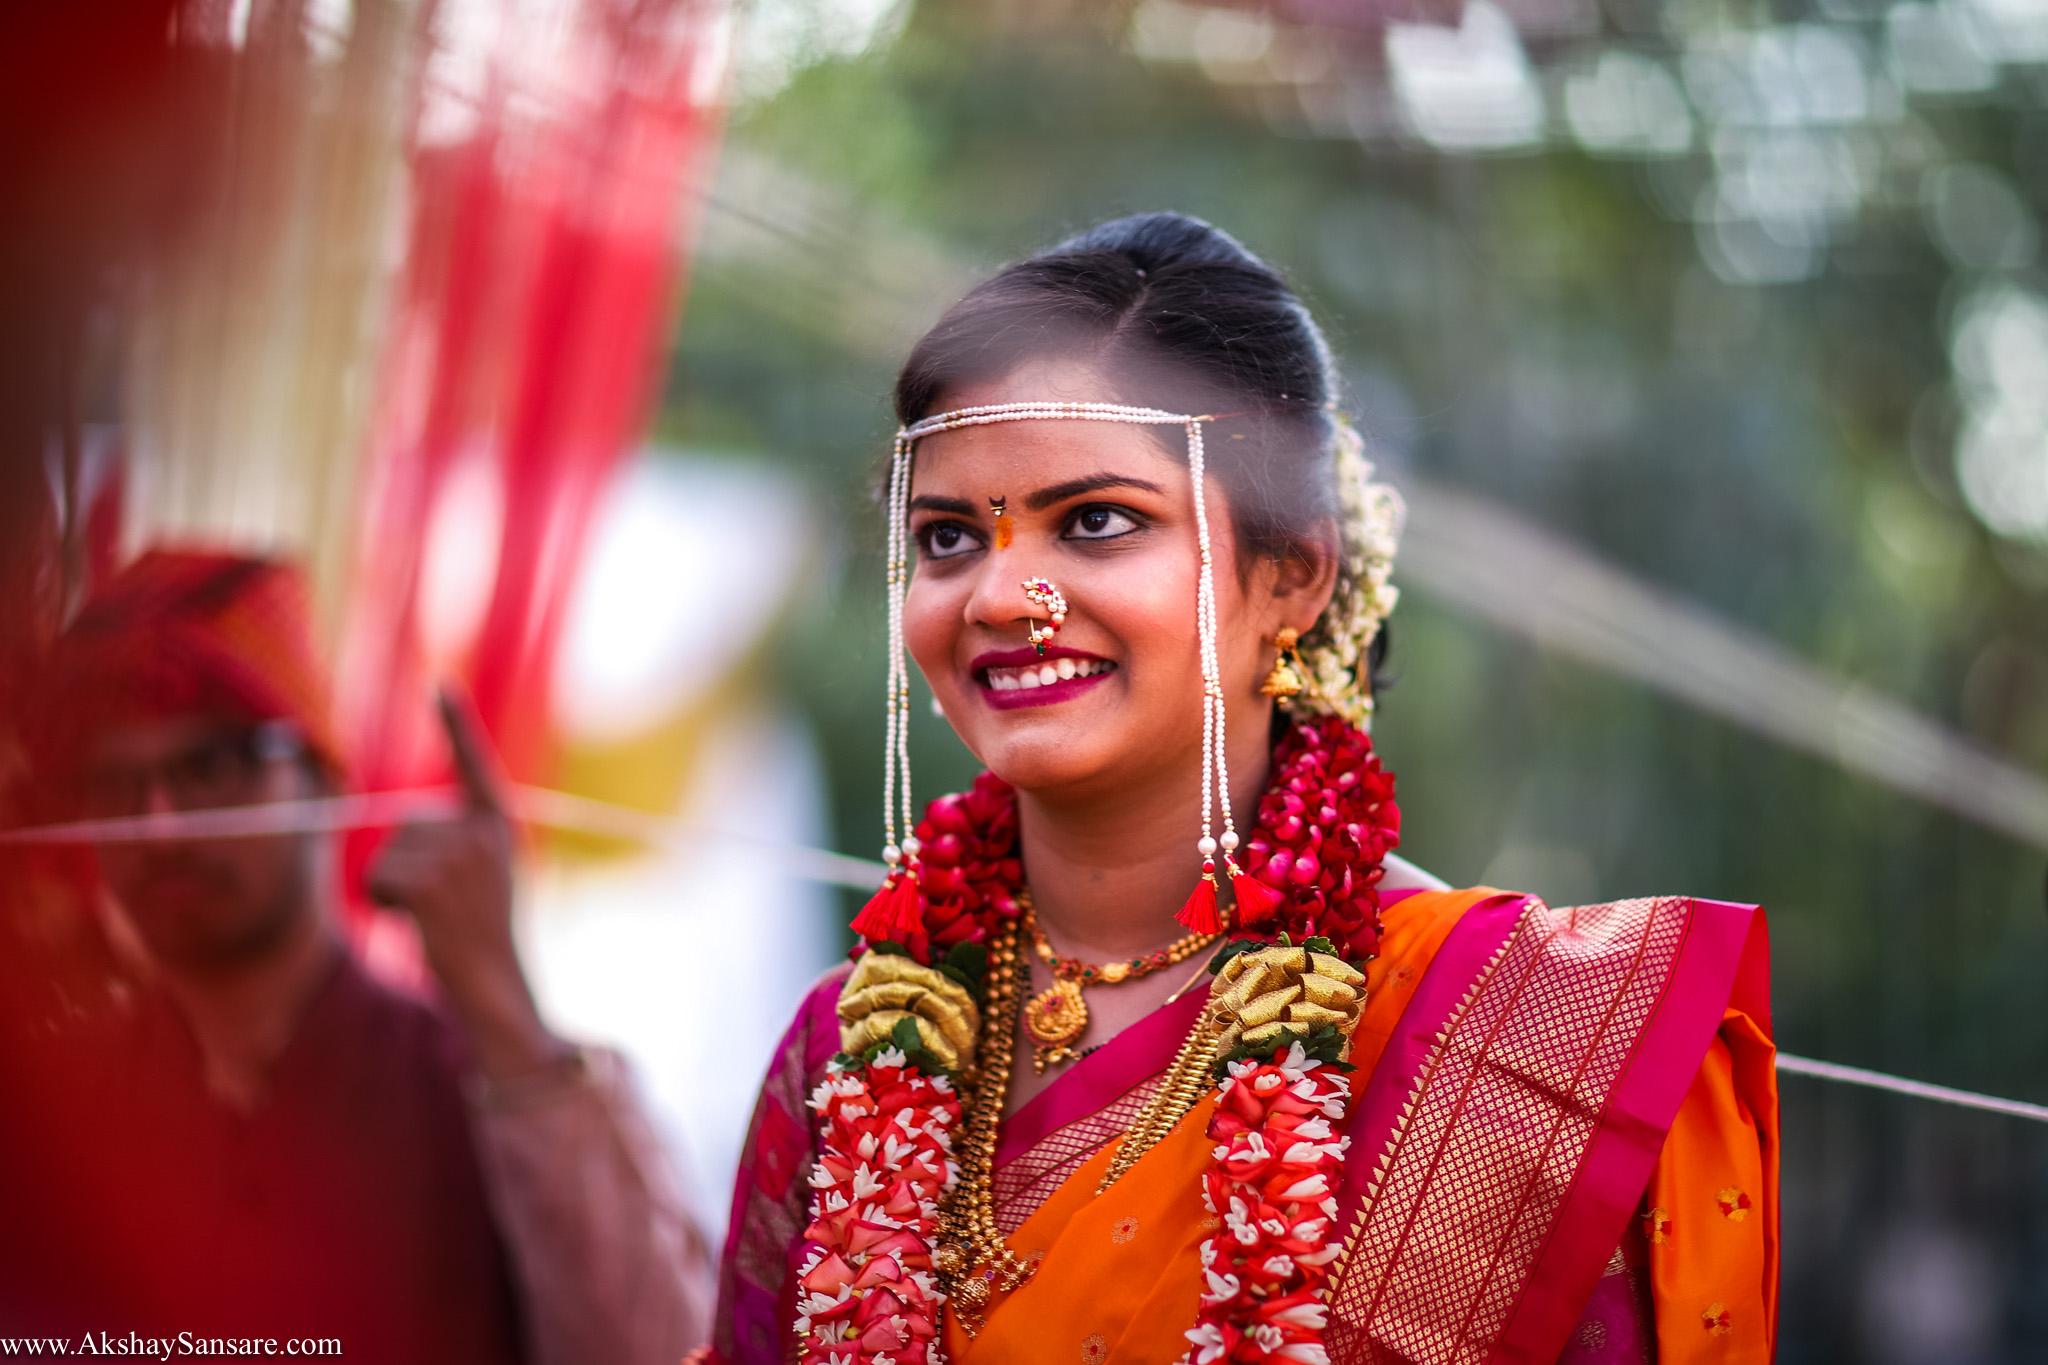 Salil x Kimaya Akshay Sansare Photography Candid wedding Photographer in mumbai best(36).jpg